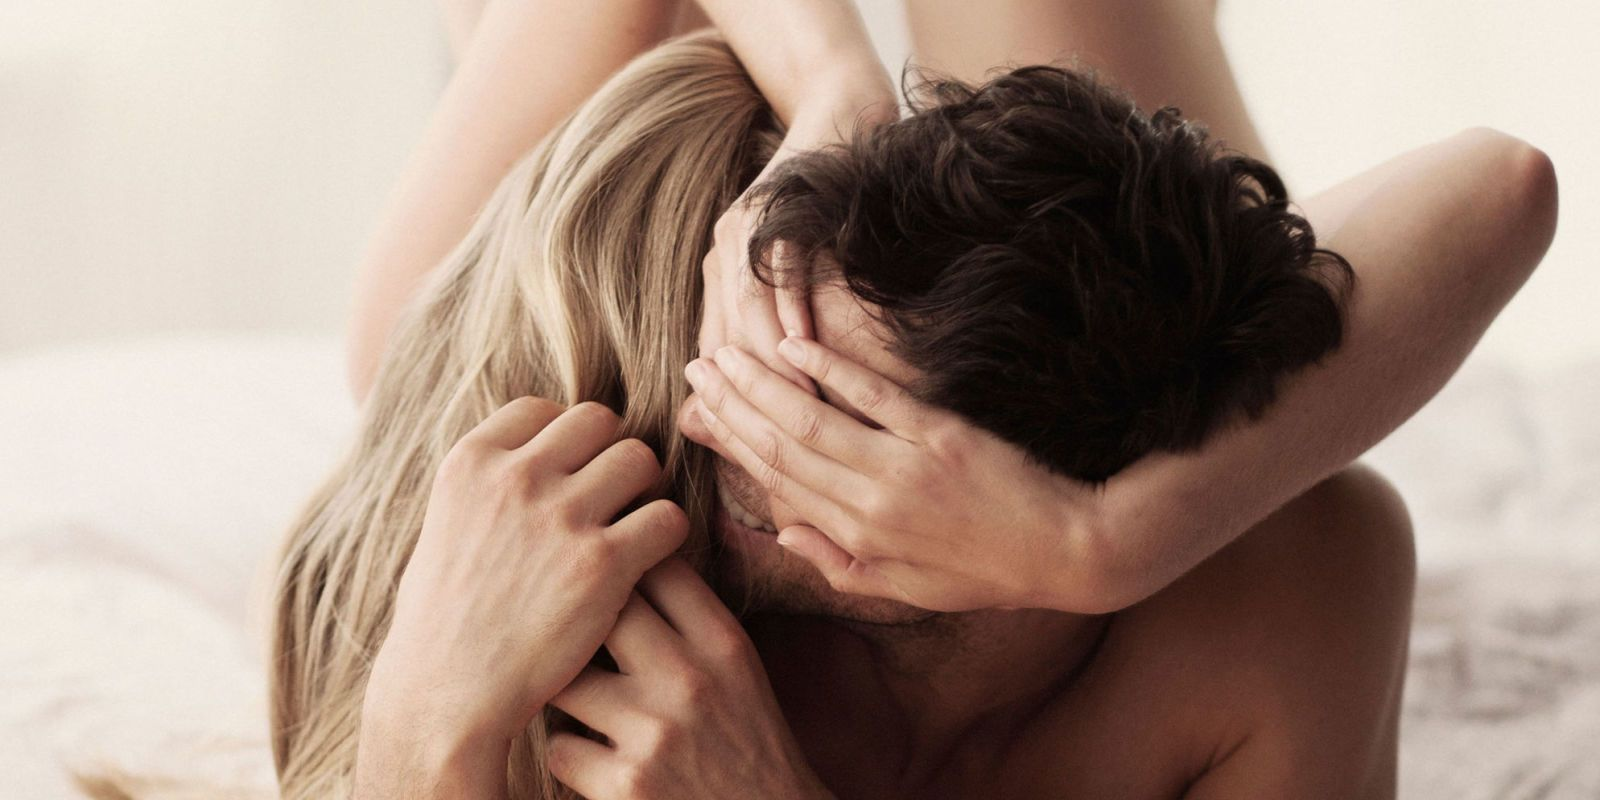 Dare period on uti while sex necessary try all